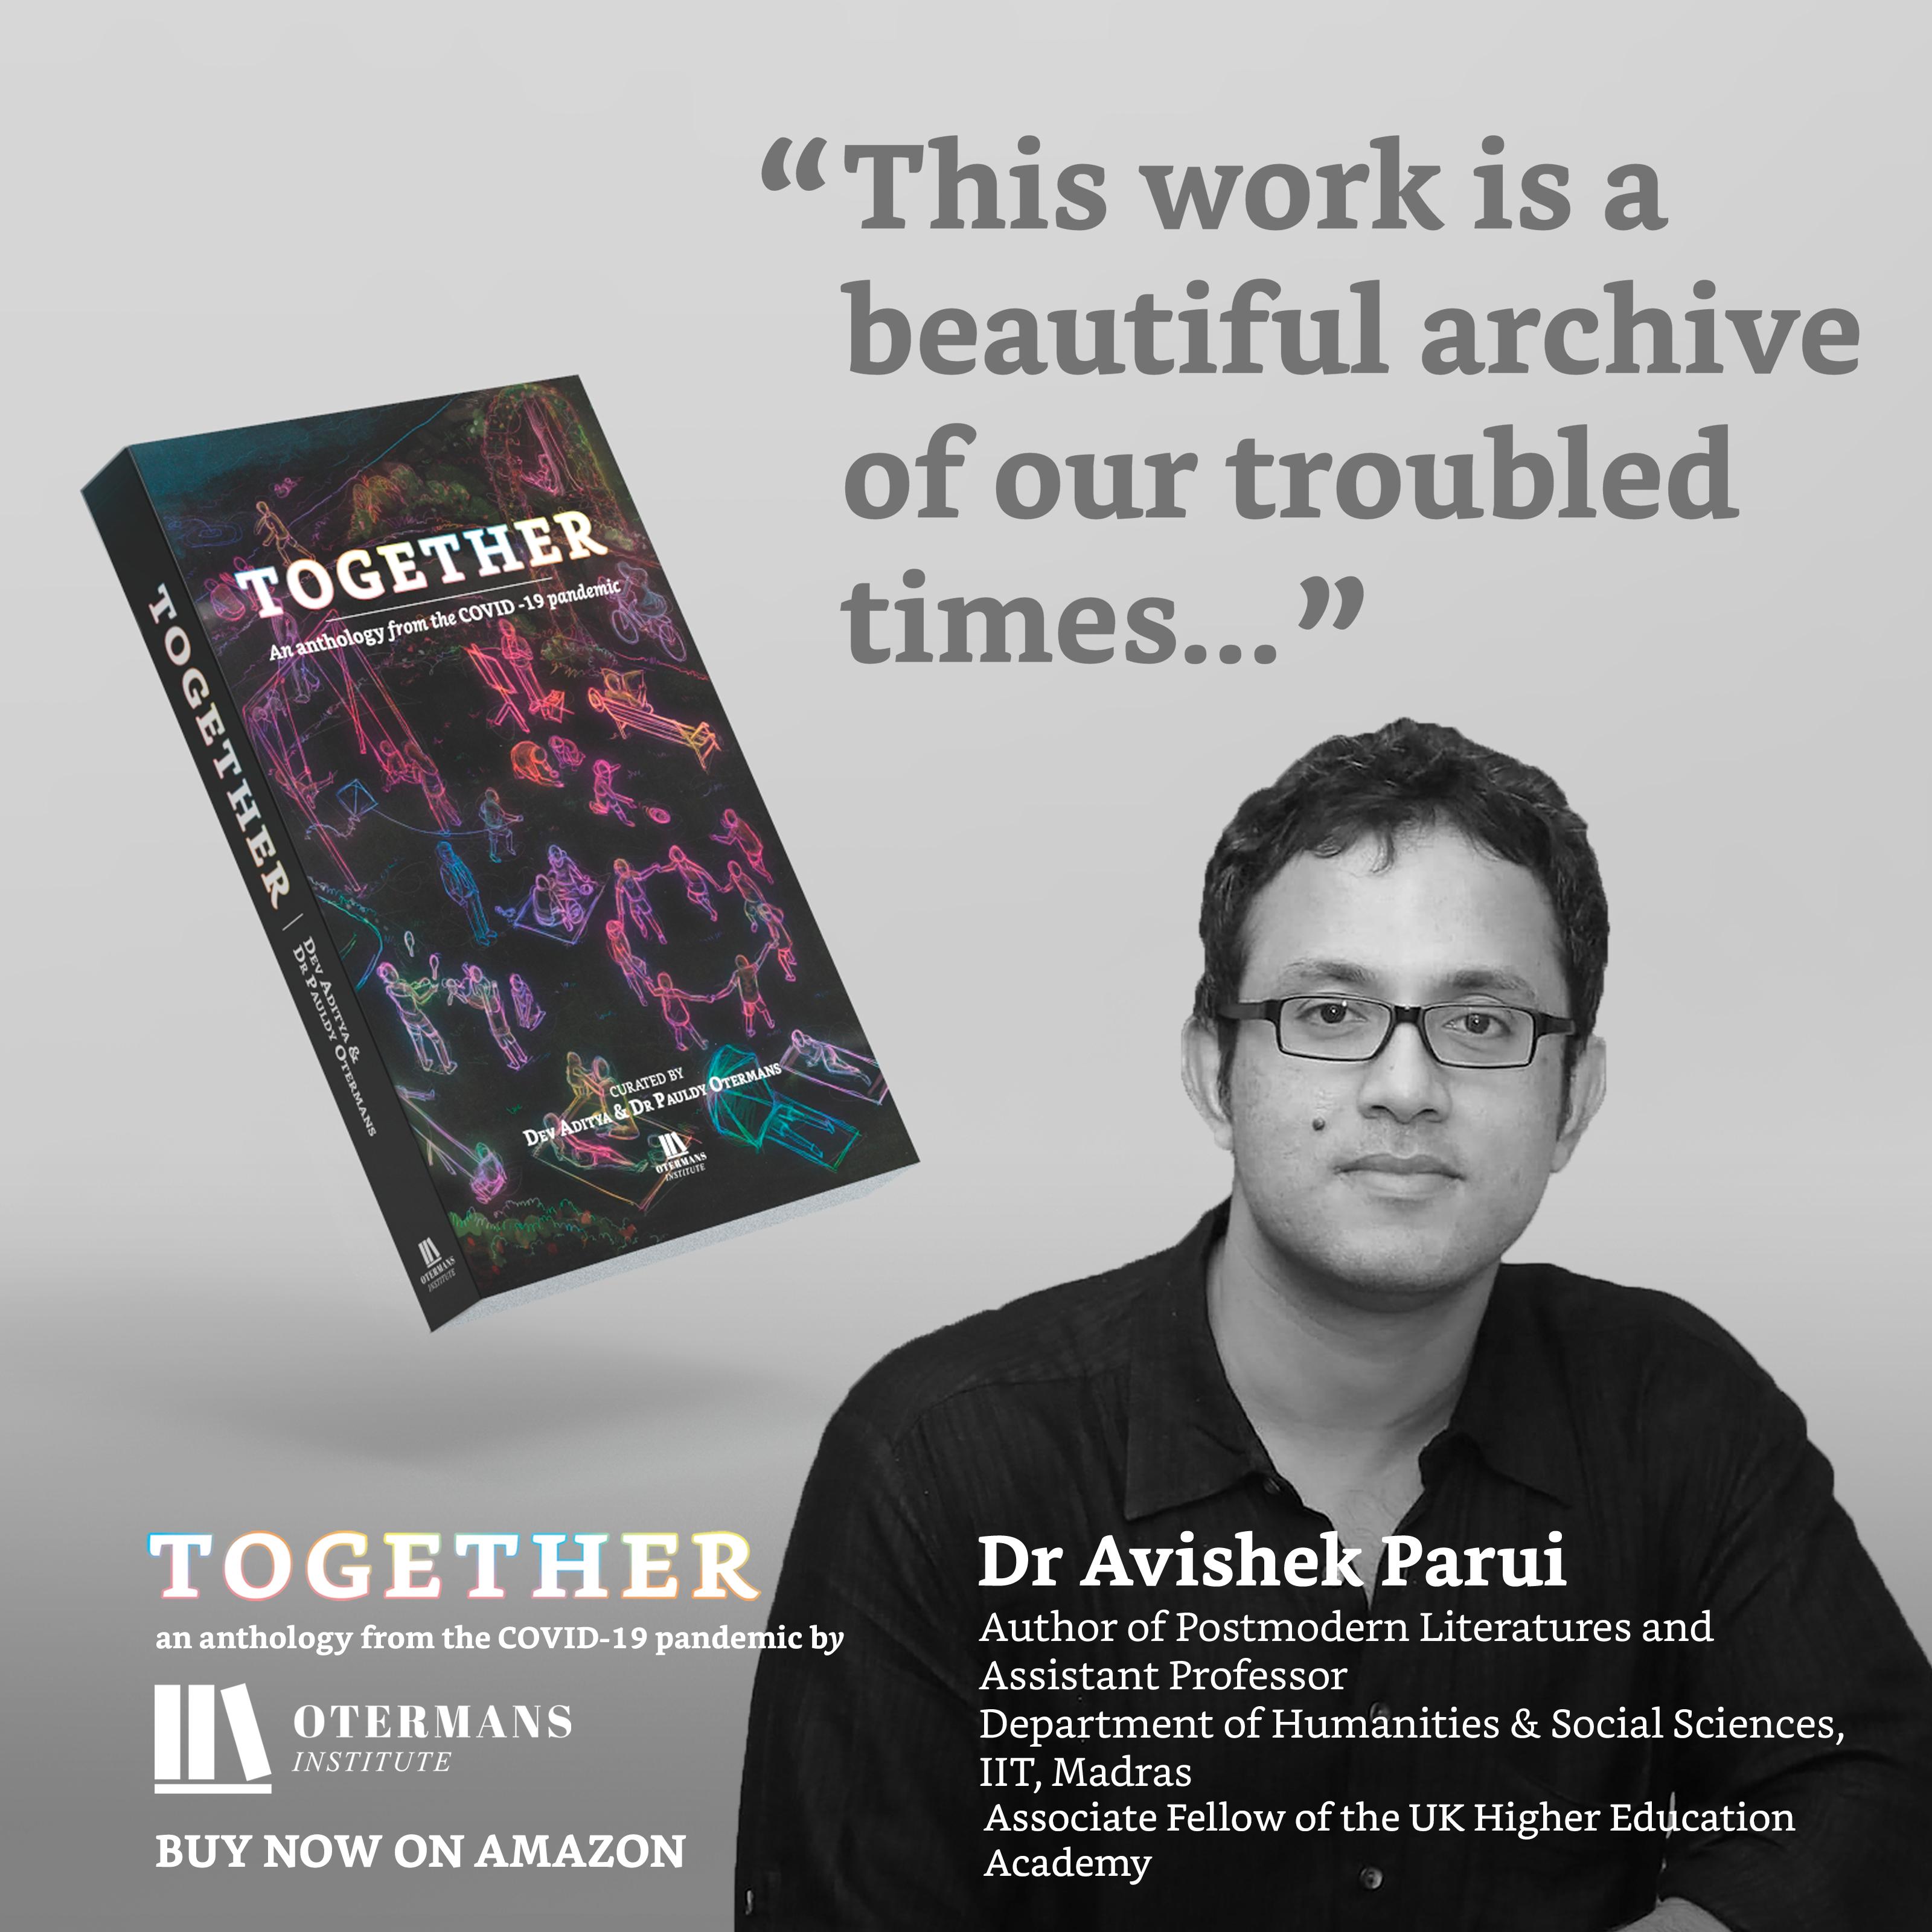 Dr Avishek Parui Quote